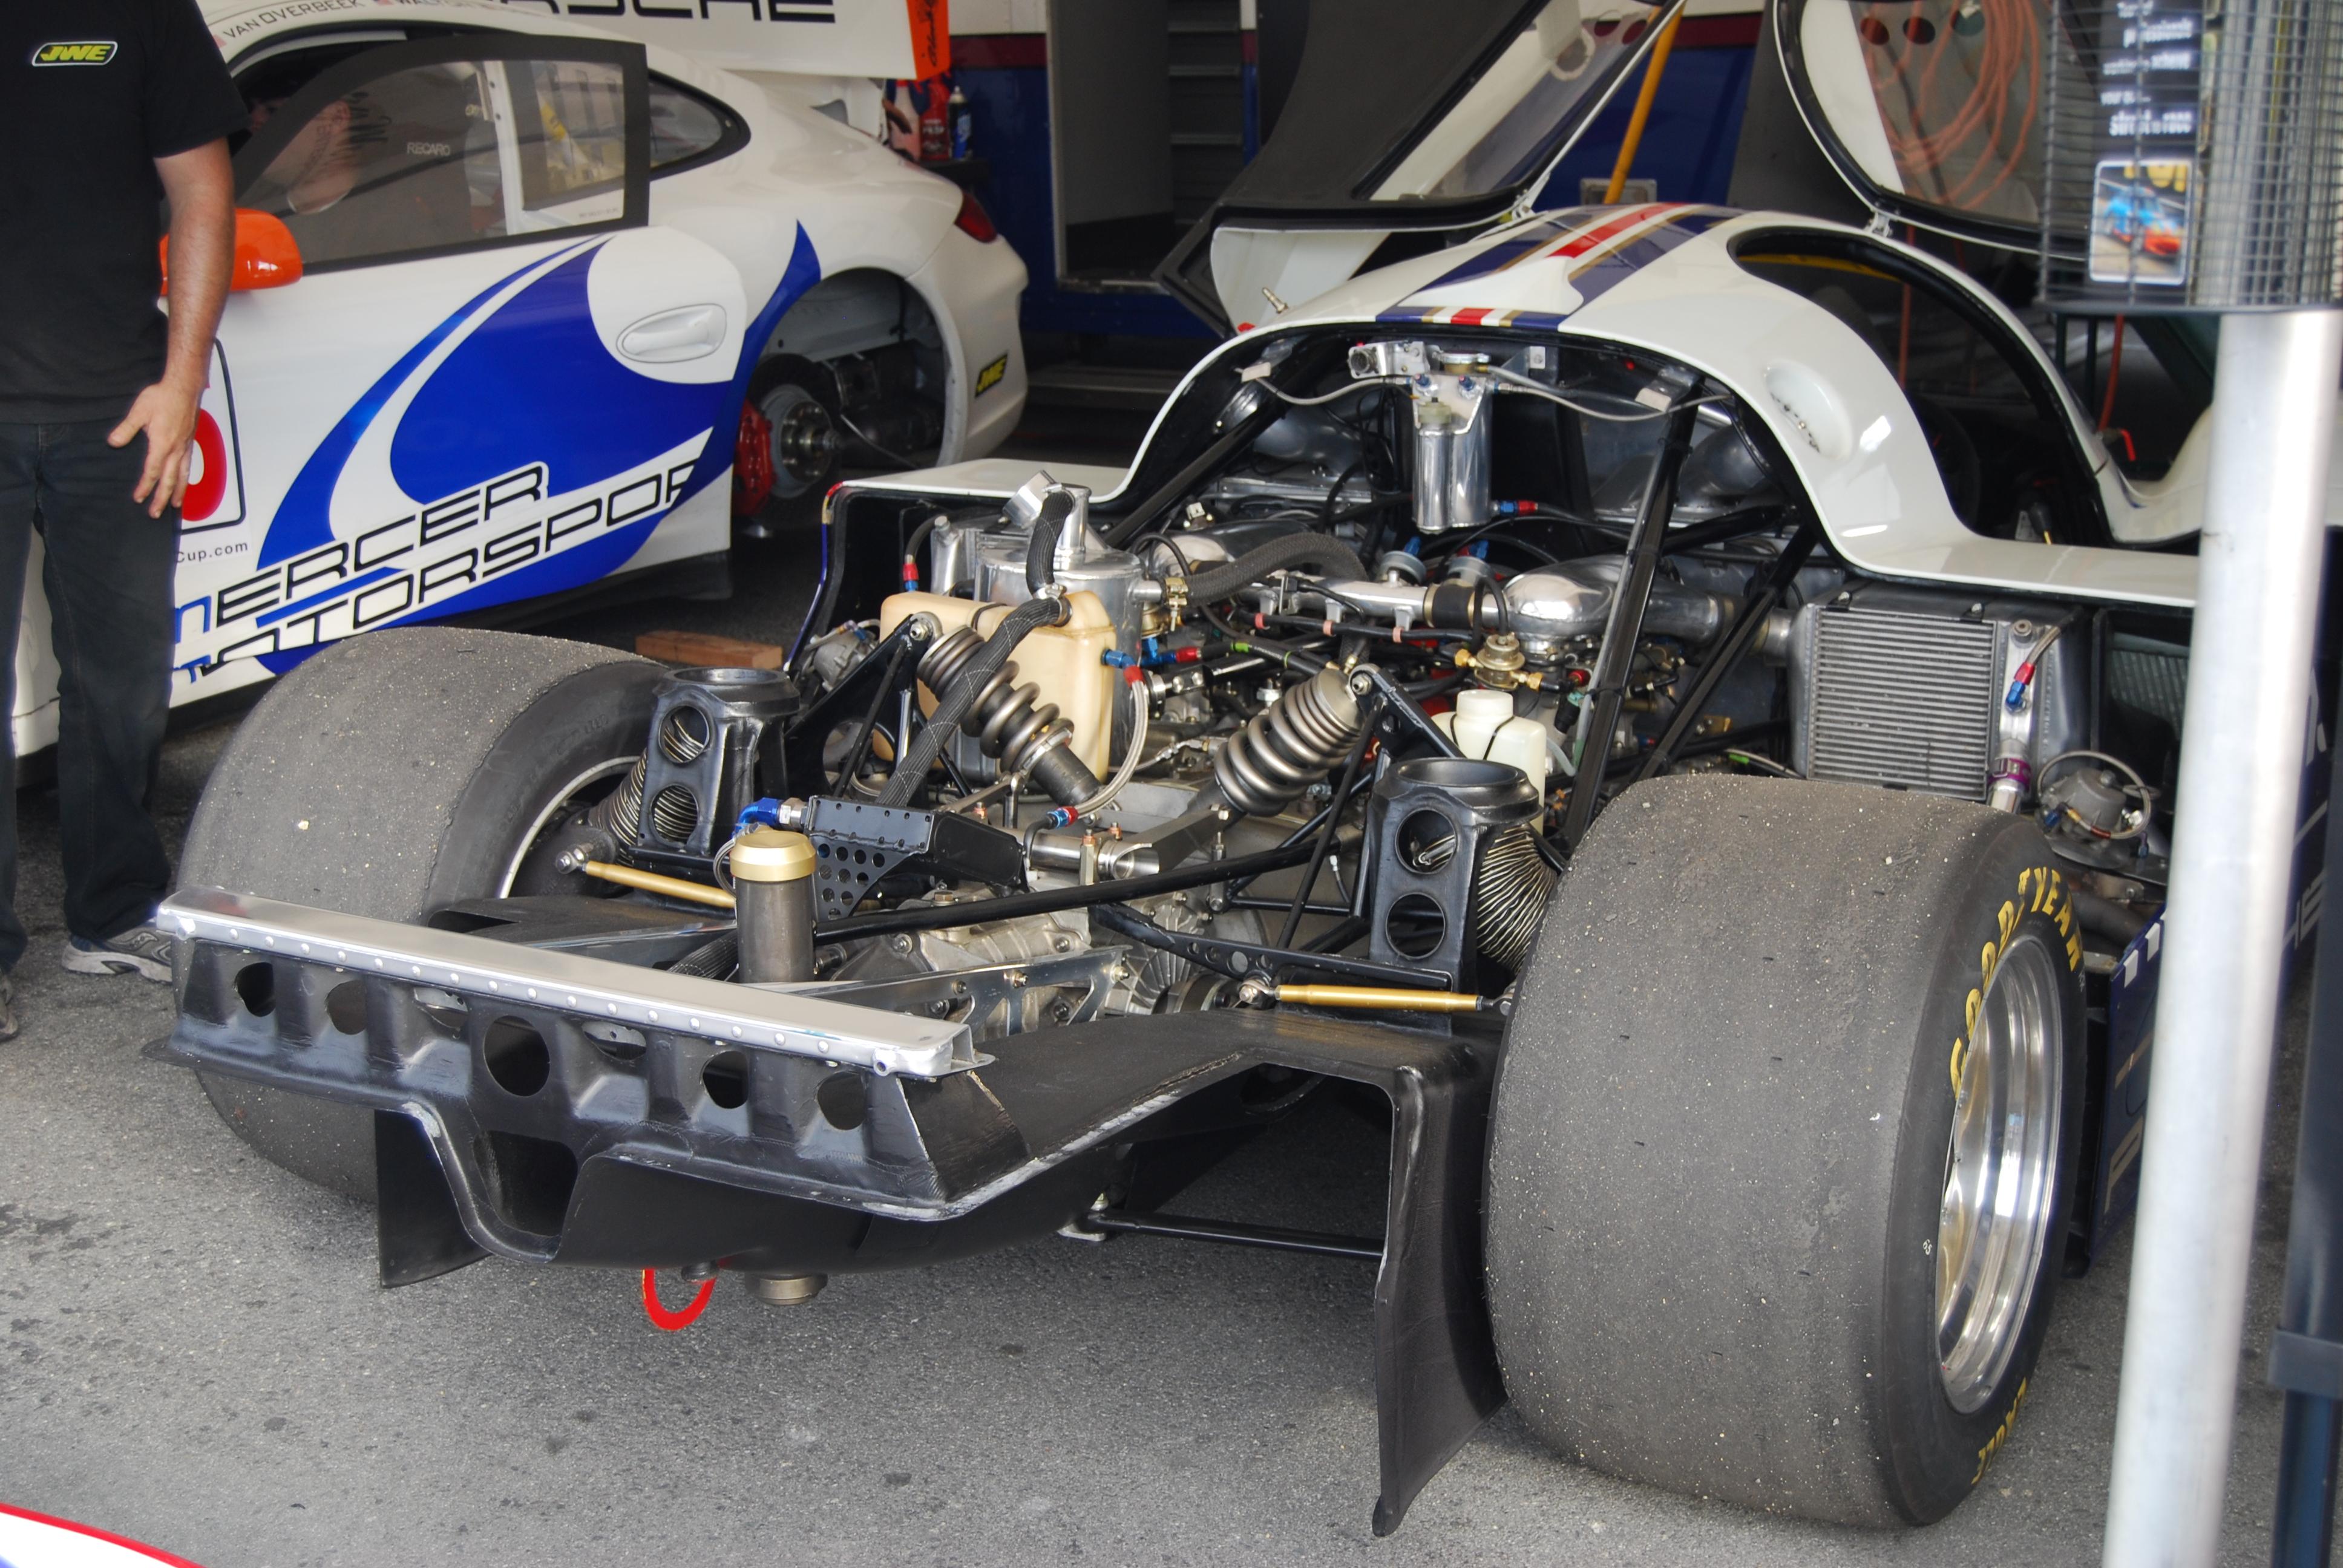 File Porsche 956 962 Group C Endurance 6268830872 Jpg